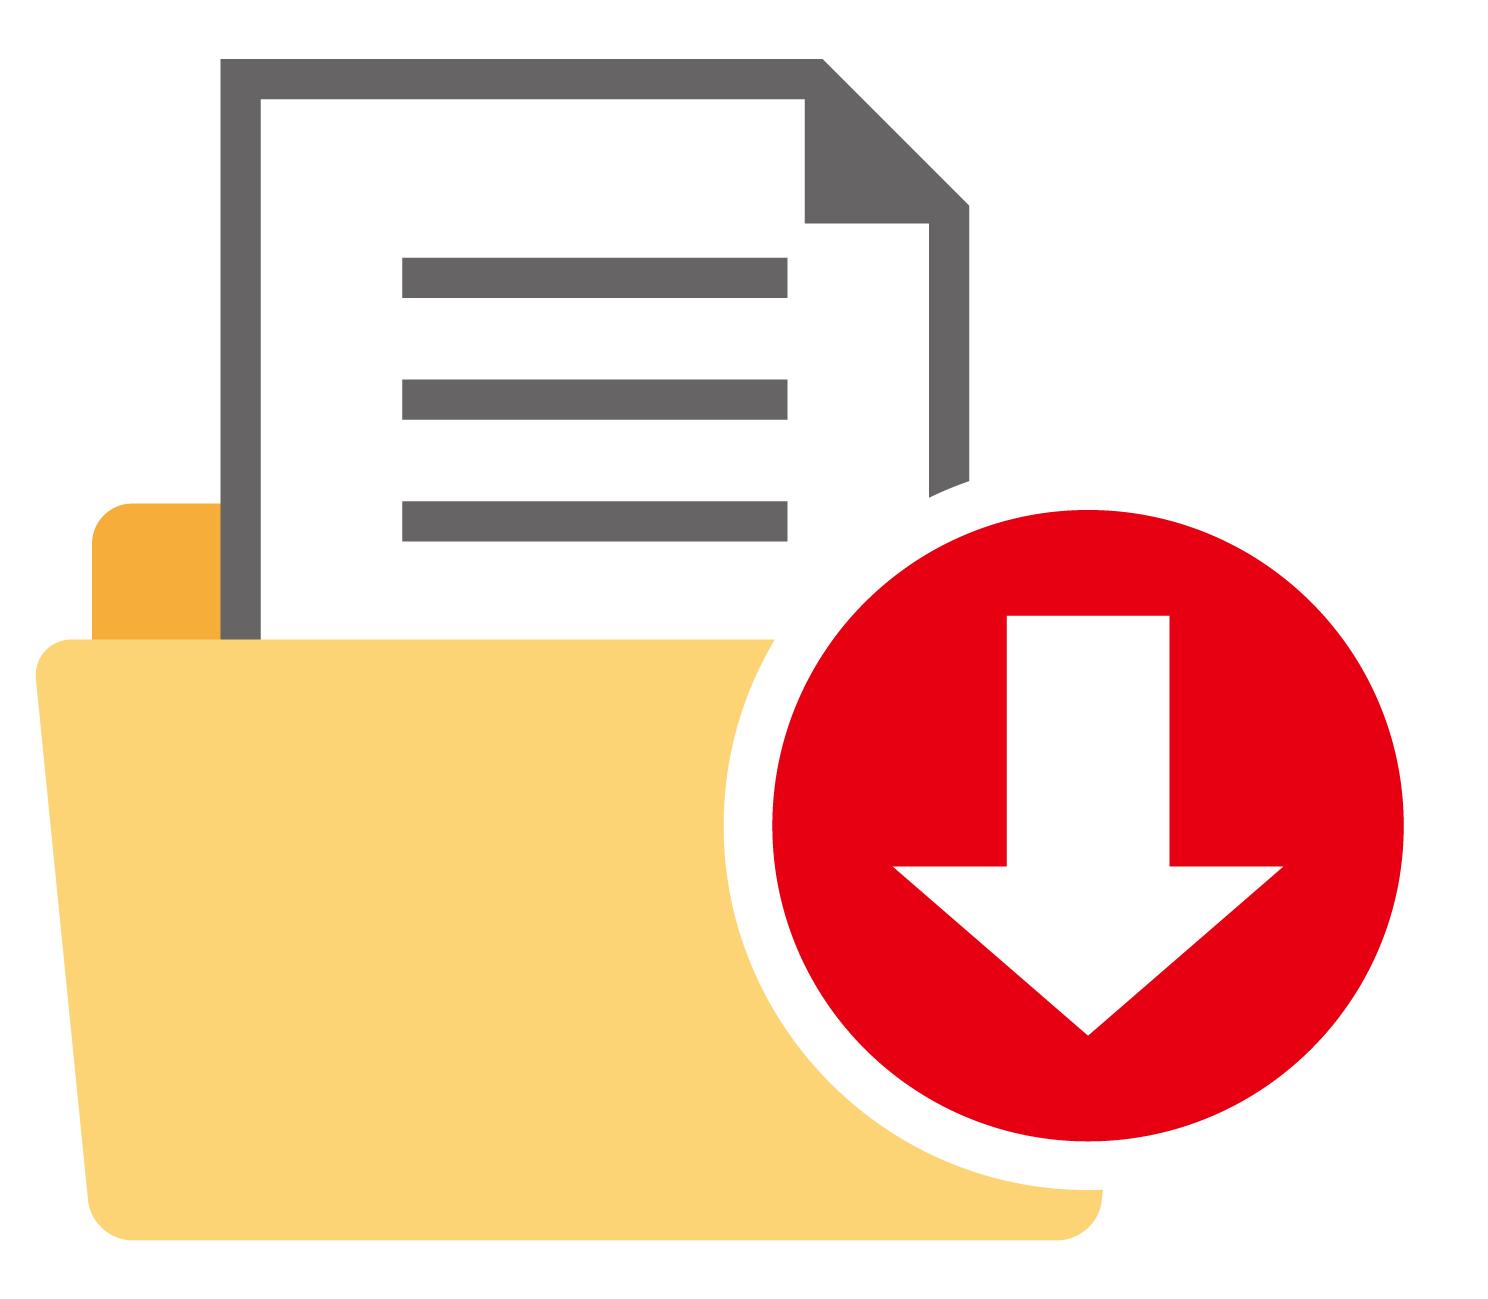 Excelファイルの自動バックアップ